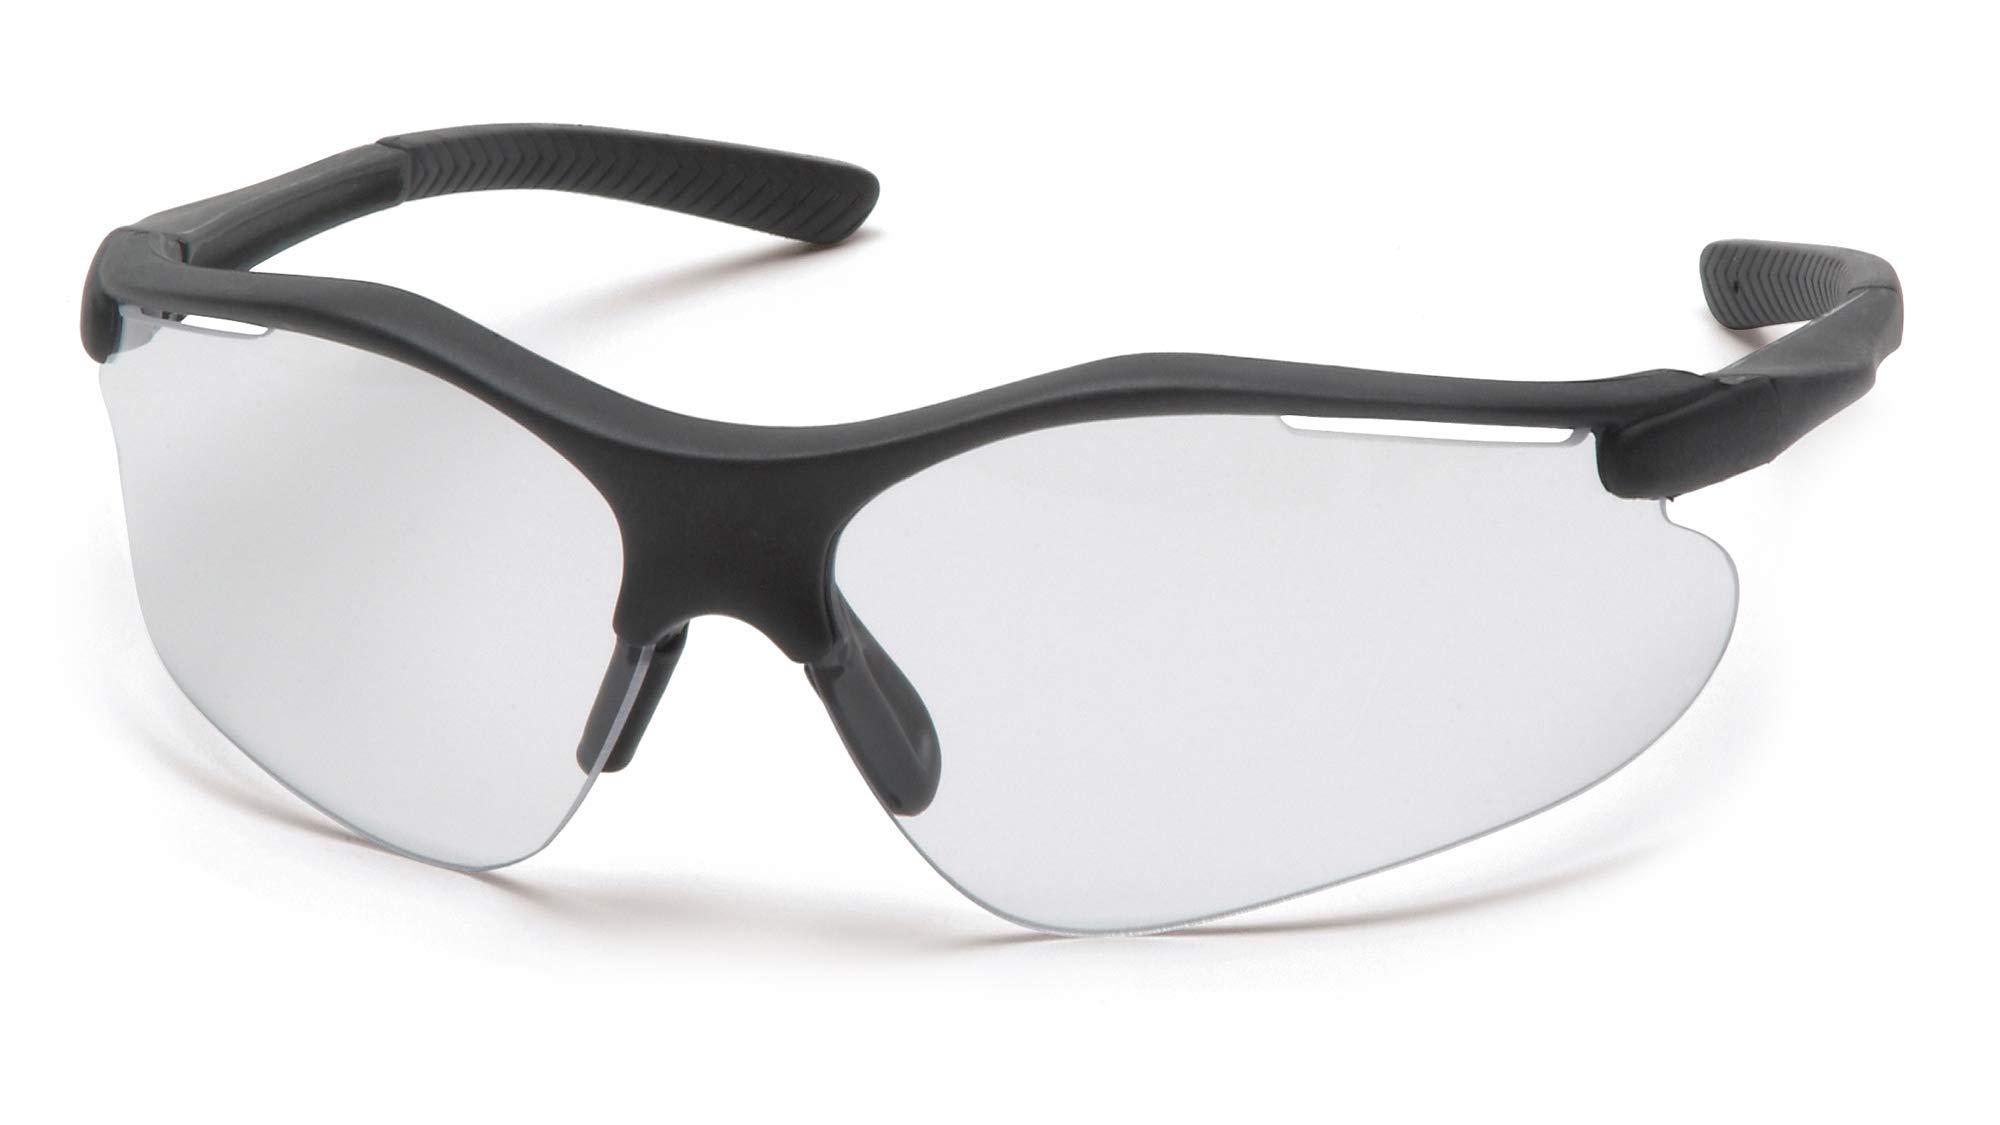 Pyramex Fortress Safety Eyewear, Clear Lens With Black Frame